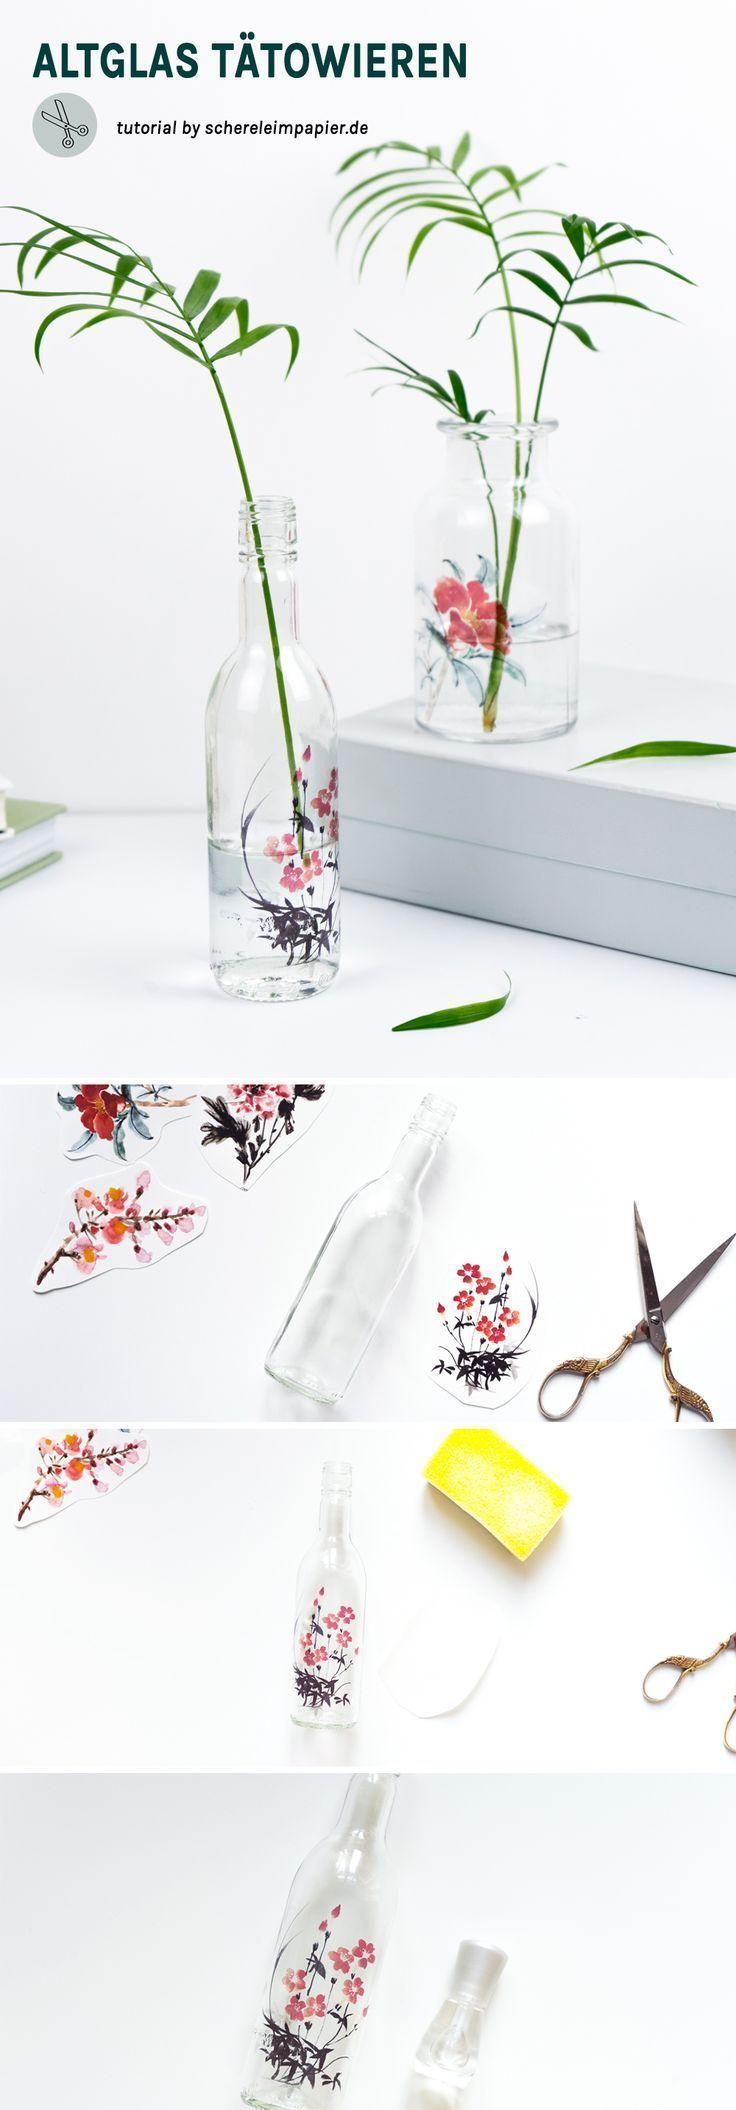 Easy Upcycling Idee mit Altglas: Tätowierte Vasen gestalten